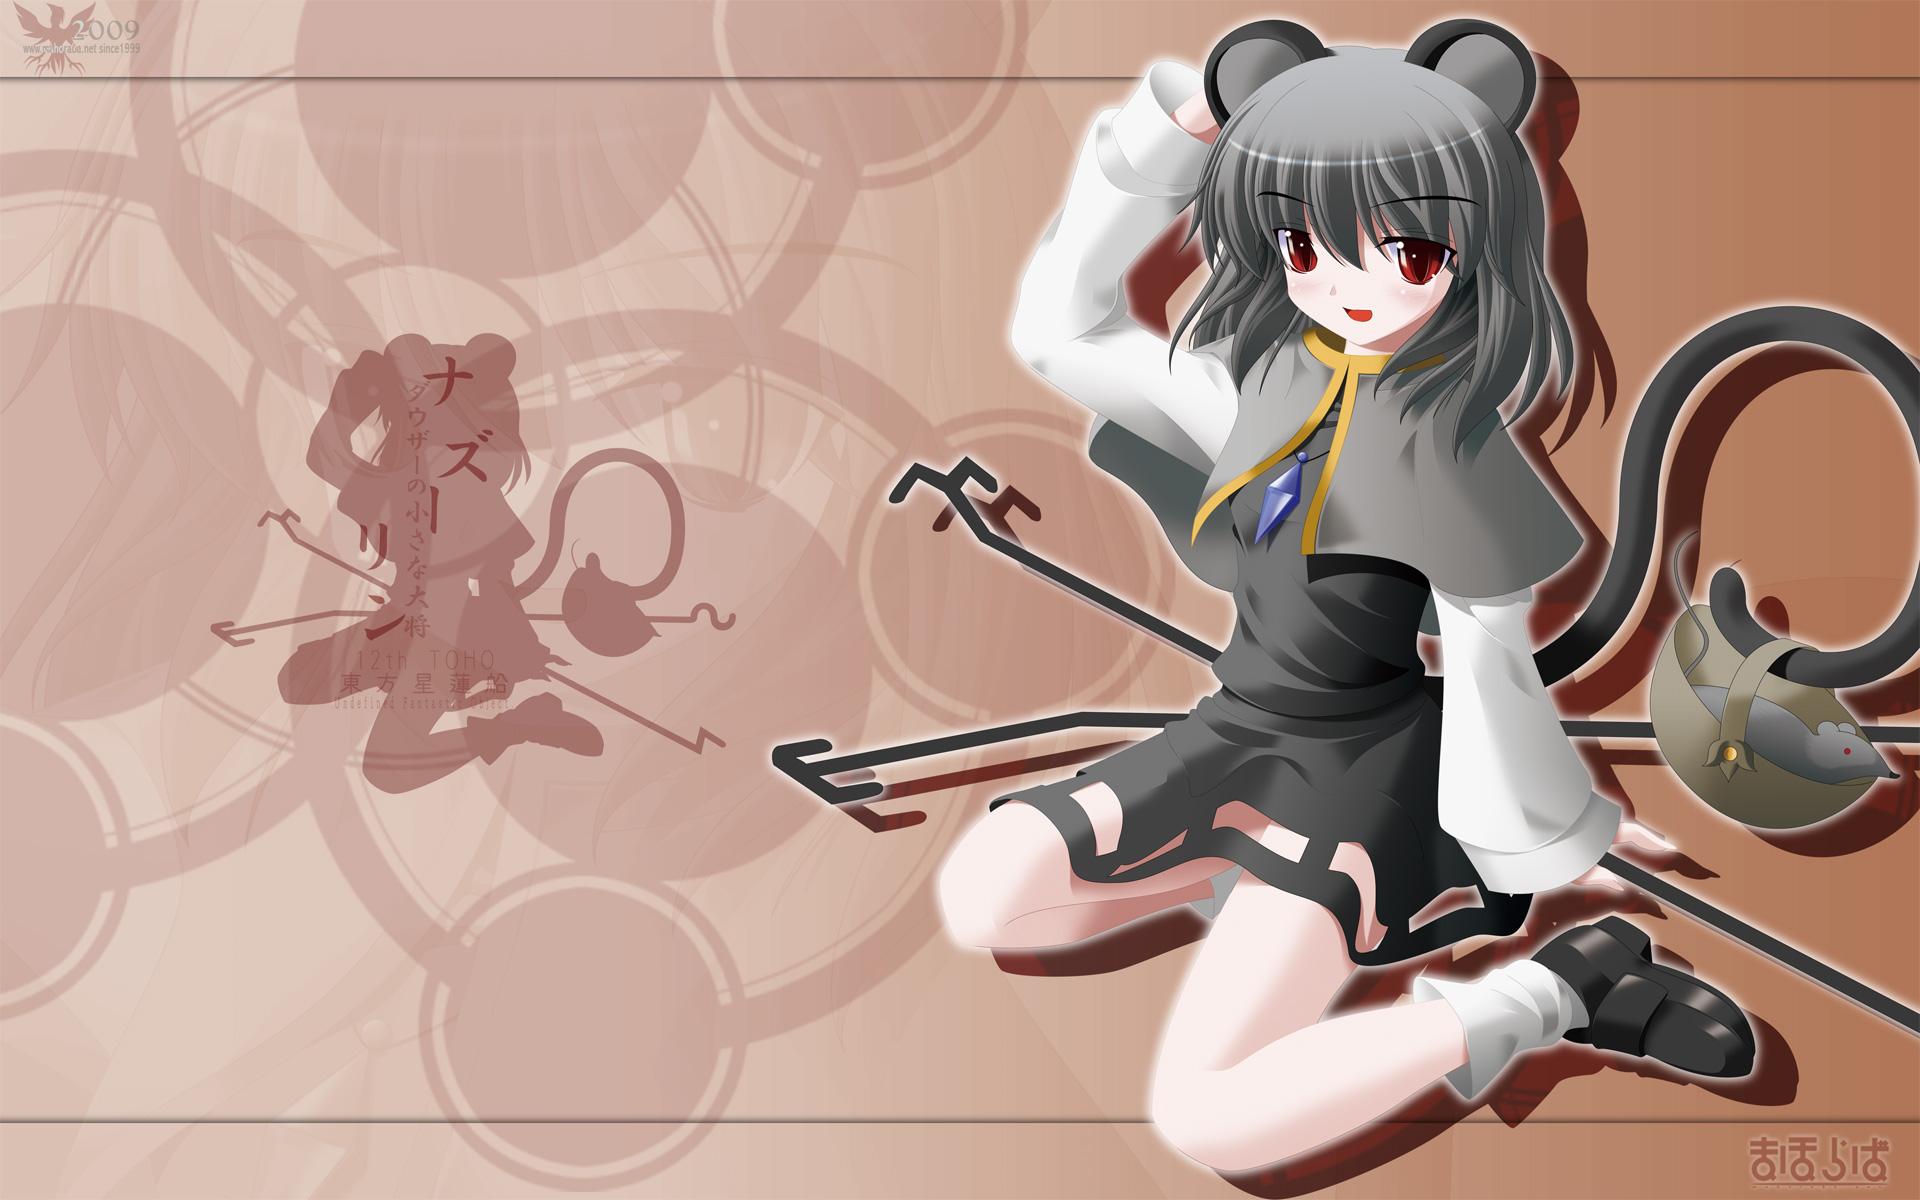 animal animal_ears gray_hair mouse mousegirl nazrin red_eyes short_hair side_b skirt tail touhou